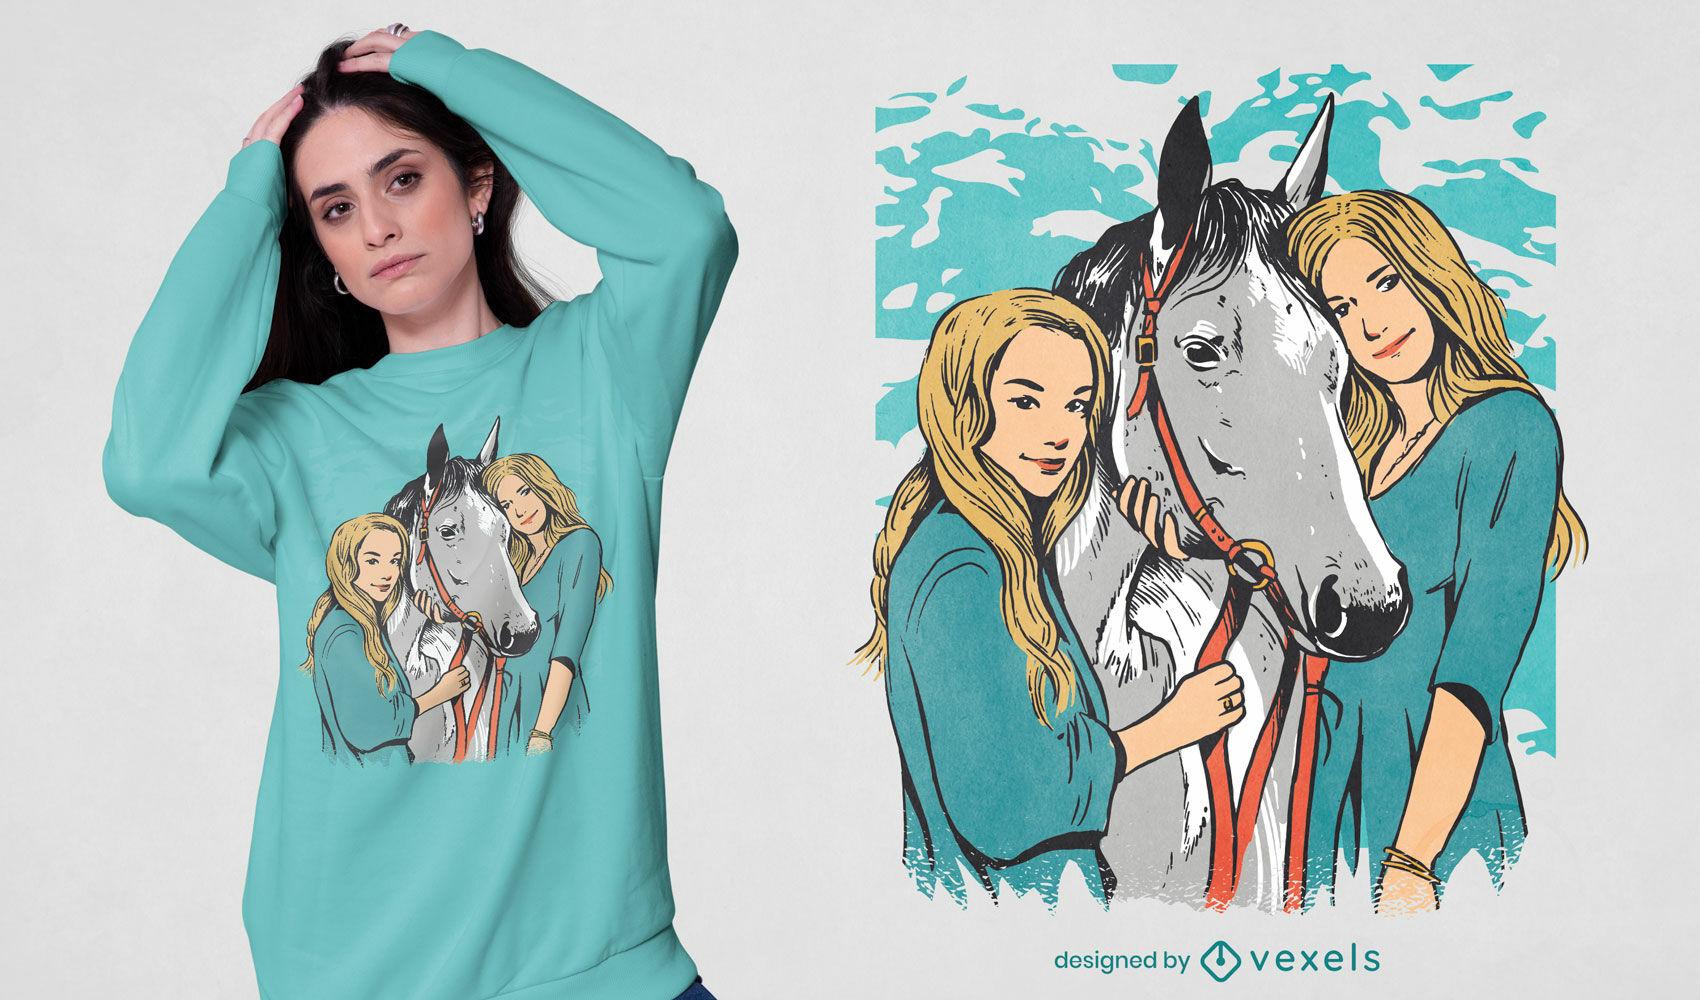 Girls and horse portrait t-shirt design